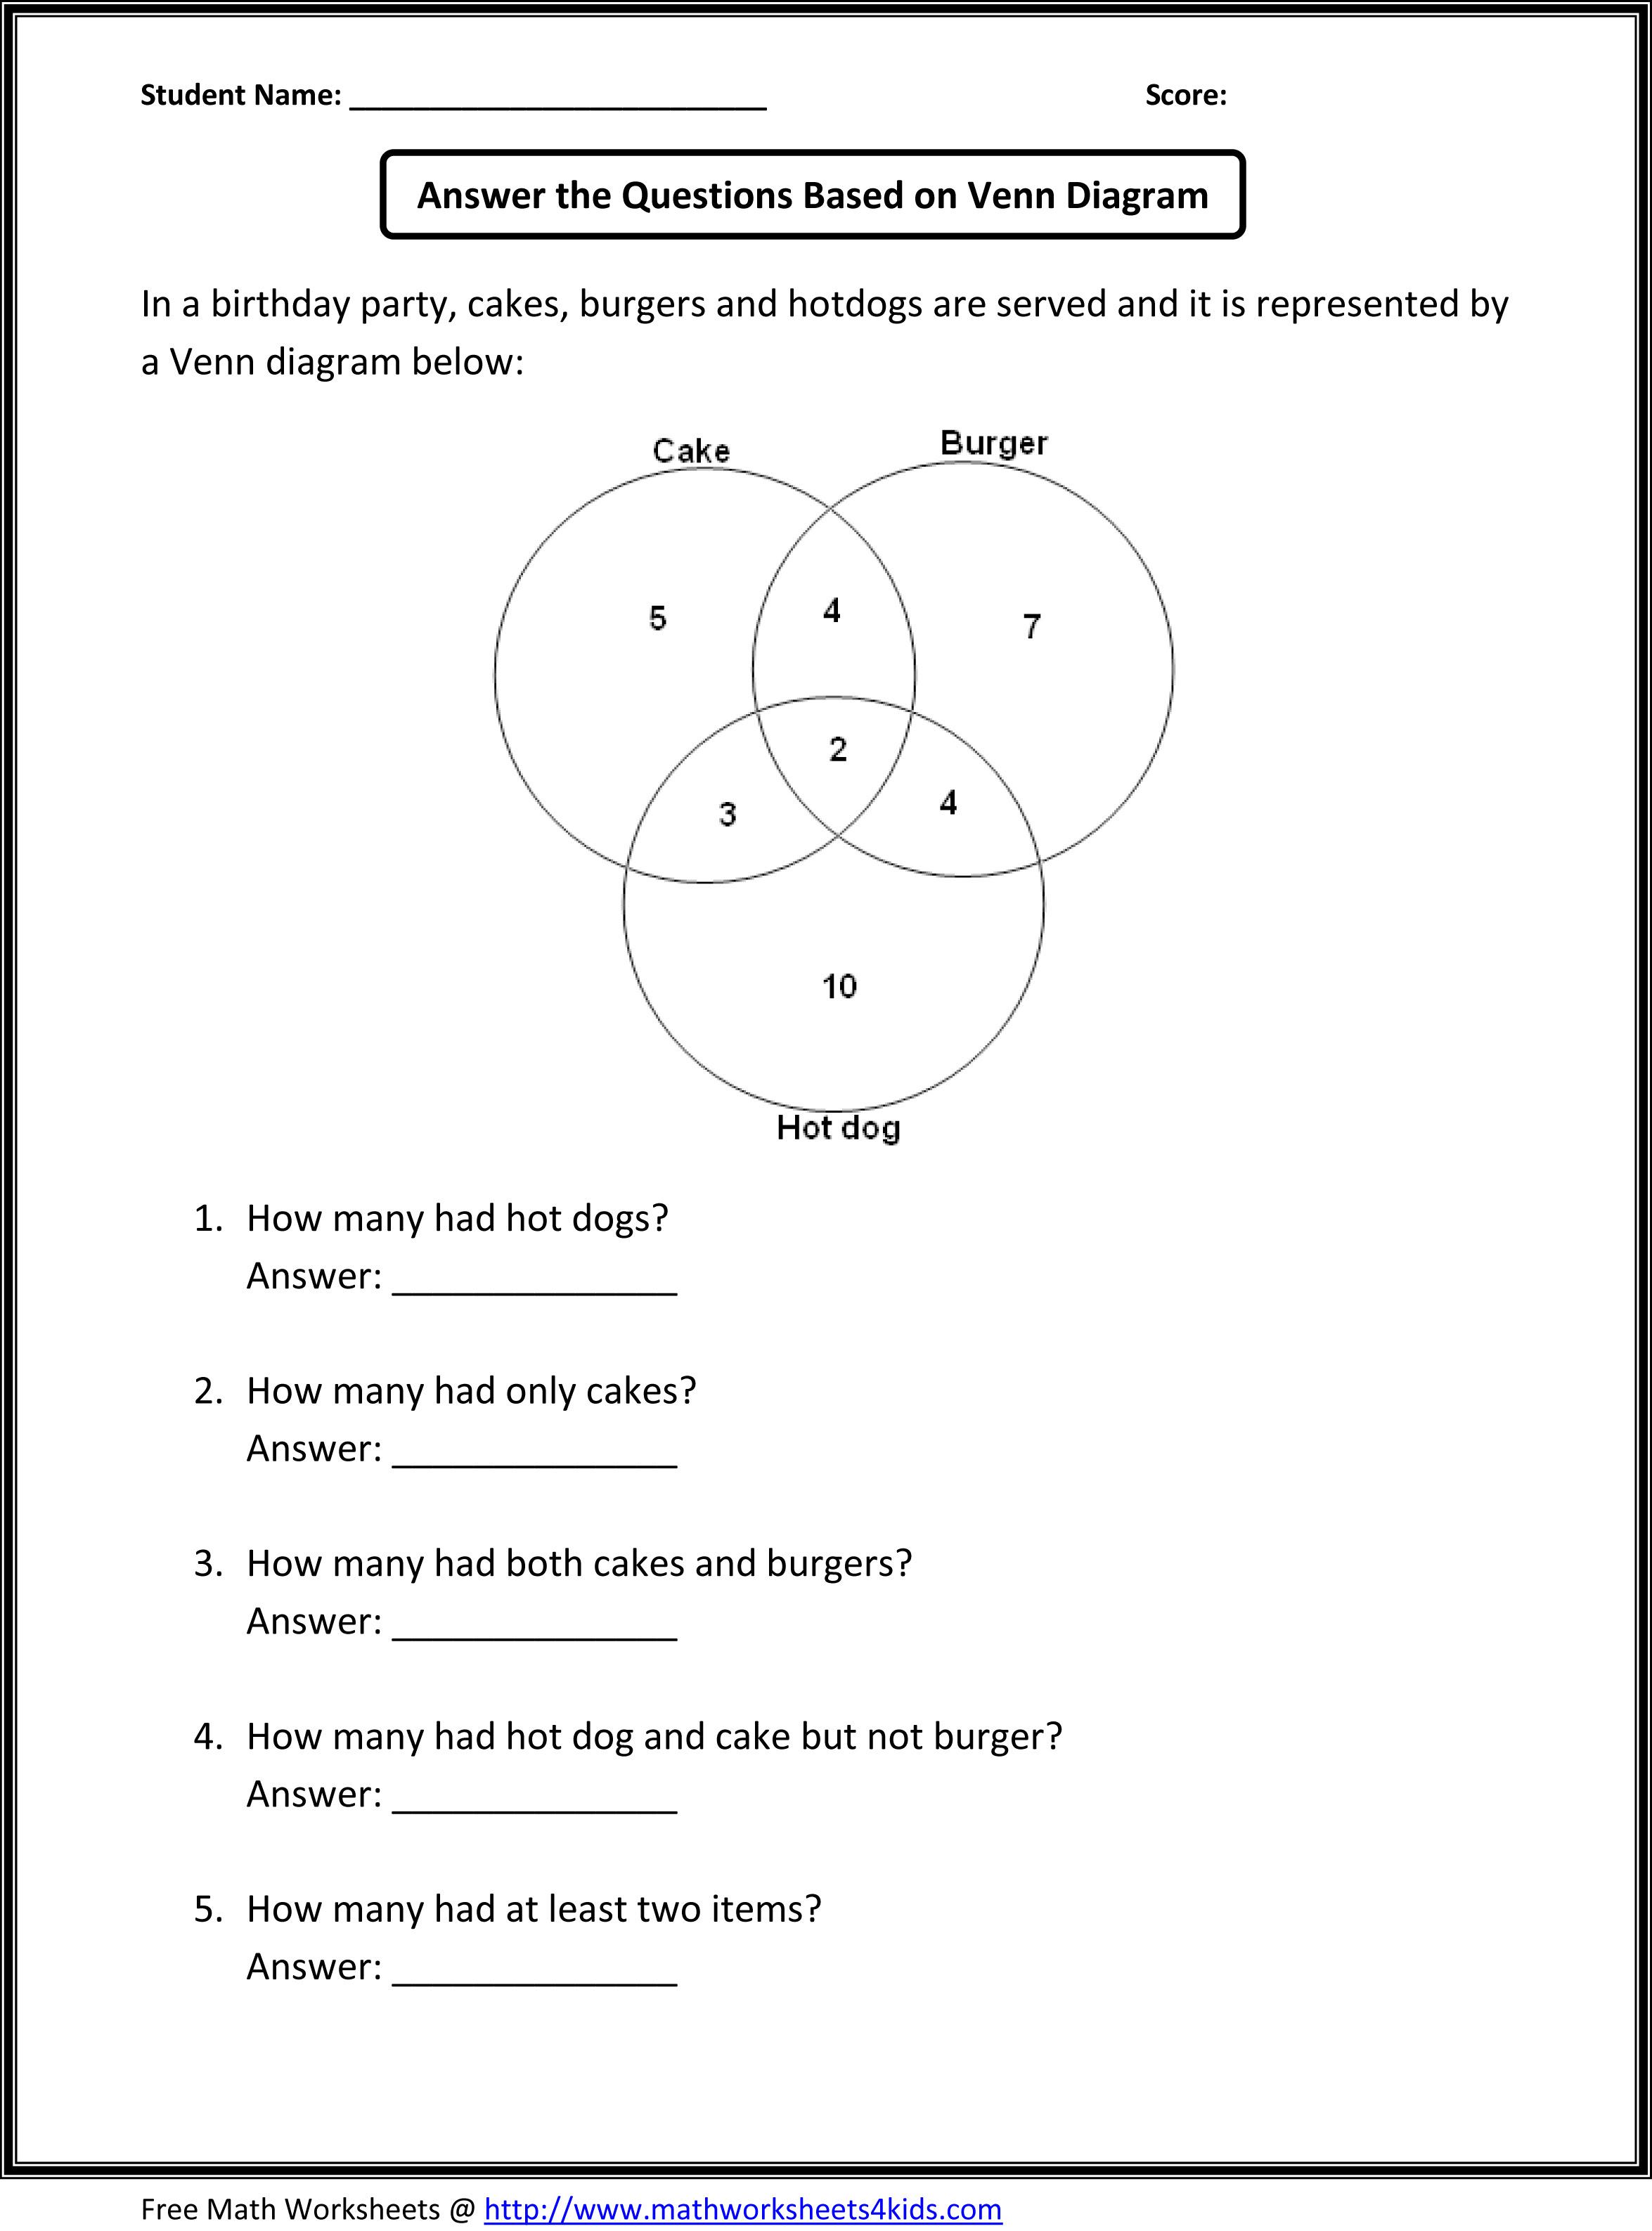 Diagram Sets And Venn Diagrams Word Problems Full Version Hd Quality Word Problems Gantt Diagramm Summercircusbz It